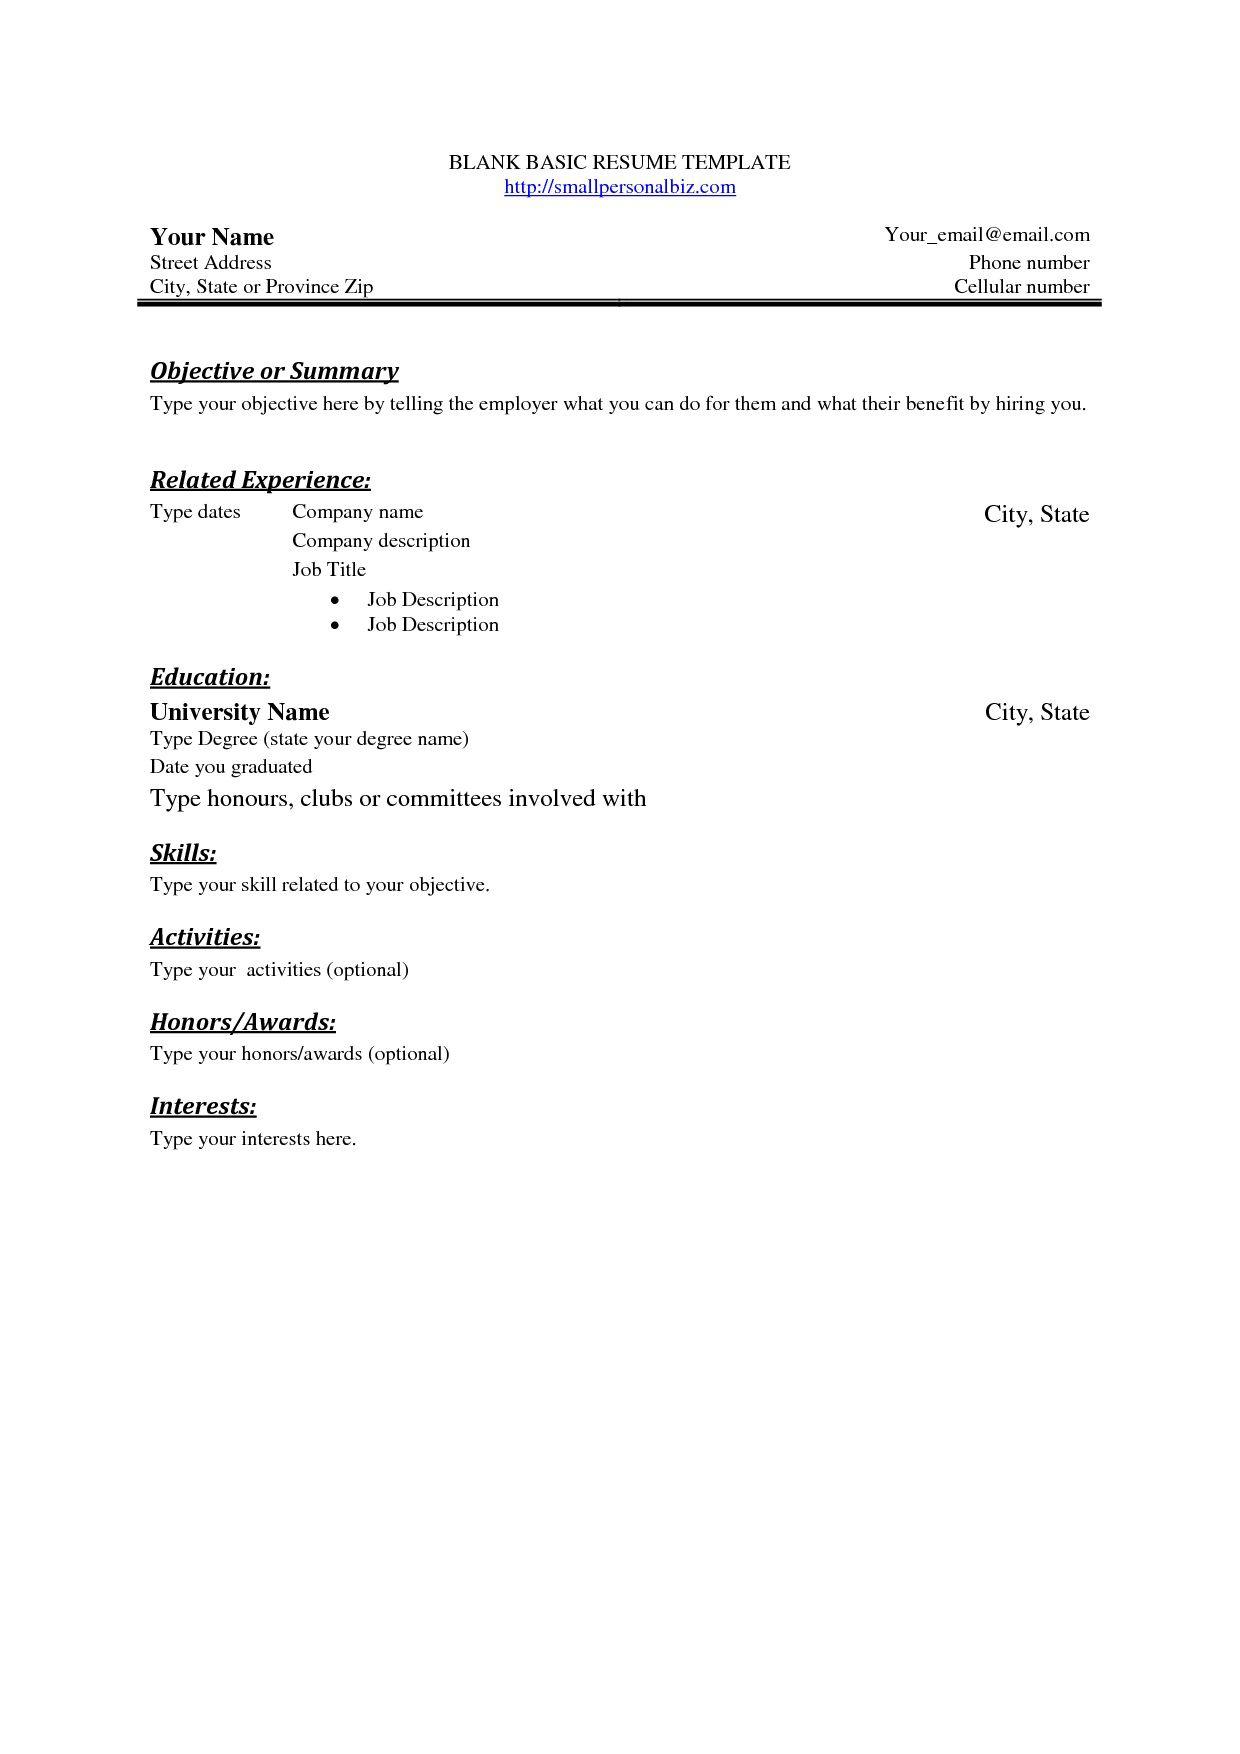 003 Frightening Basic Resume Template Free Highest Quality  Easy Download Word Australia DocFull